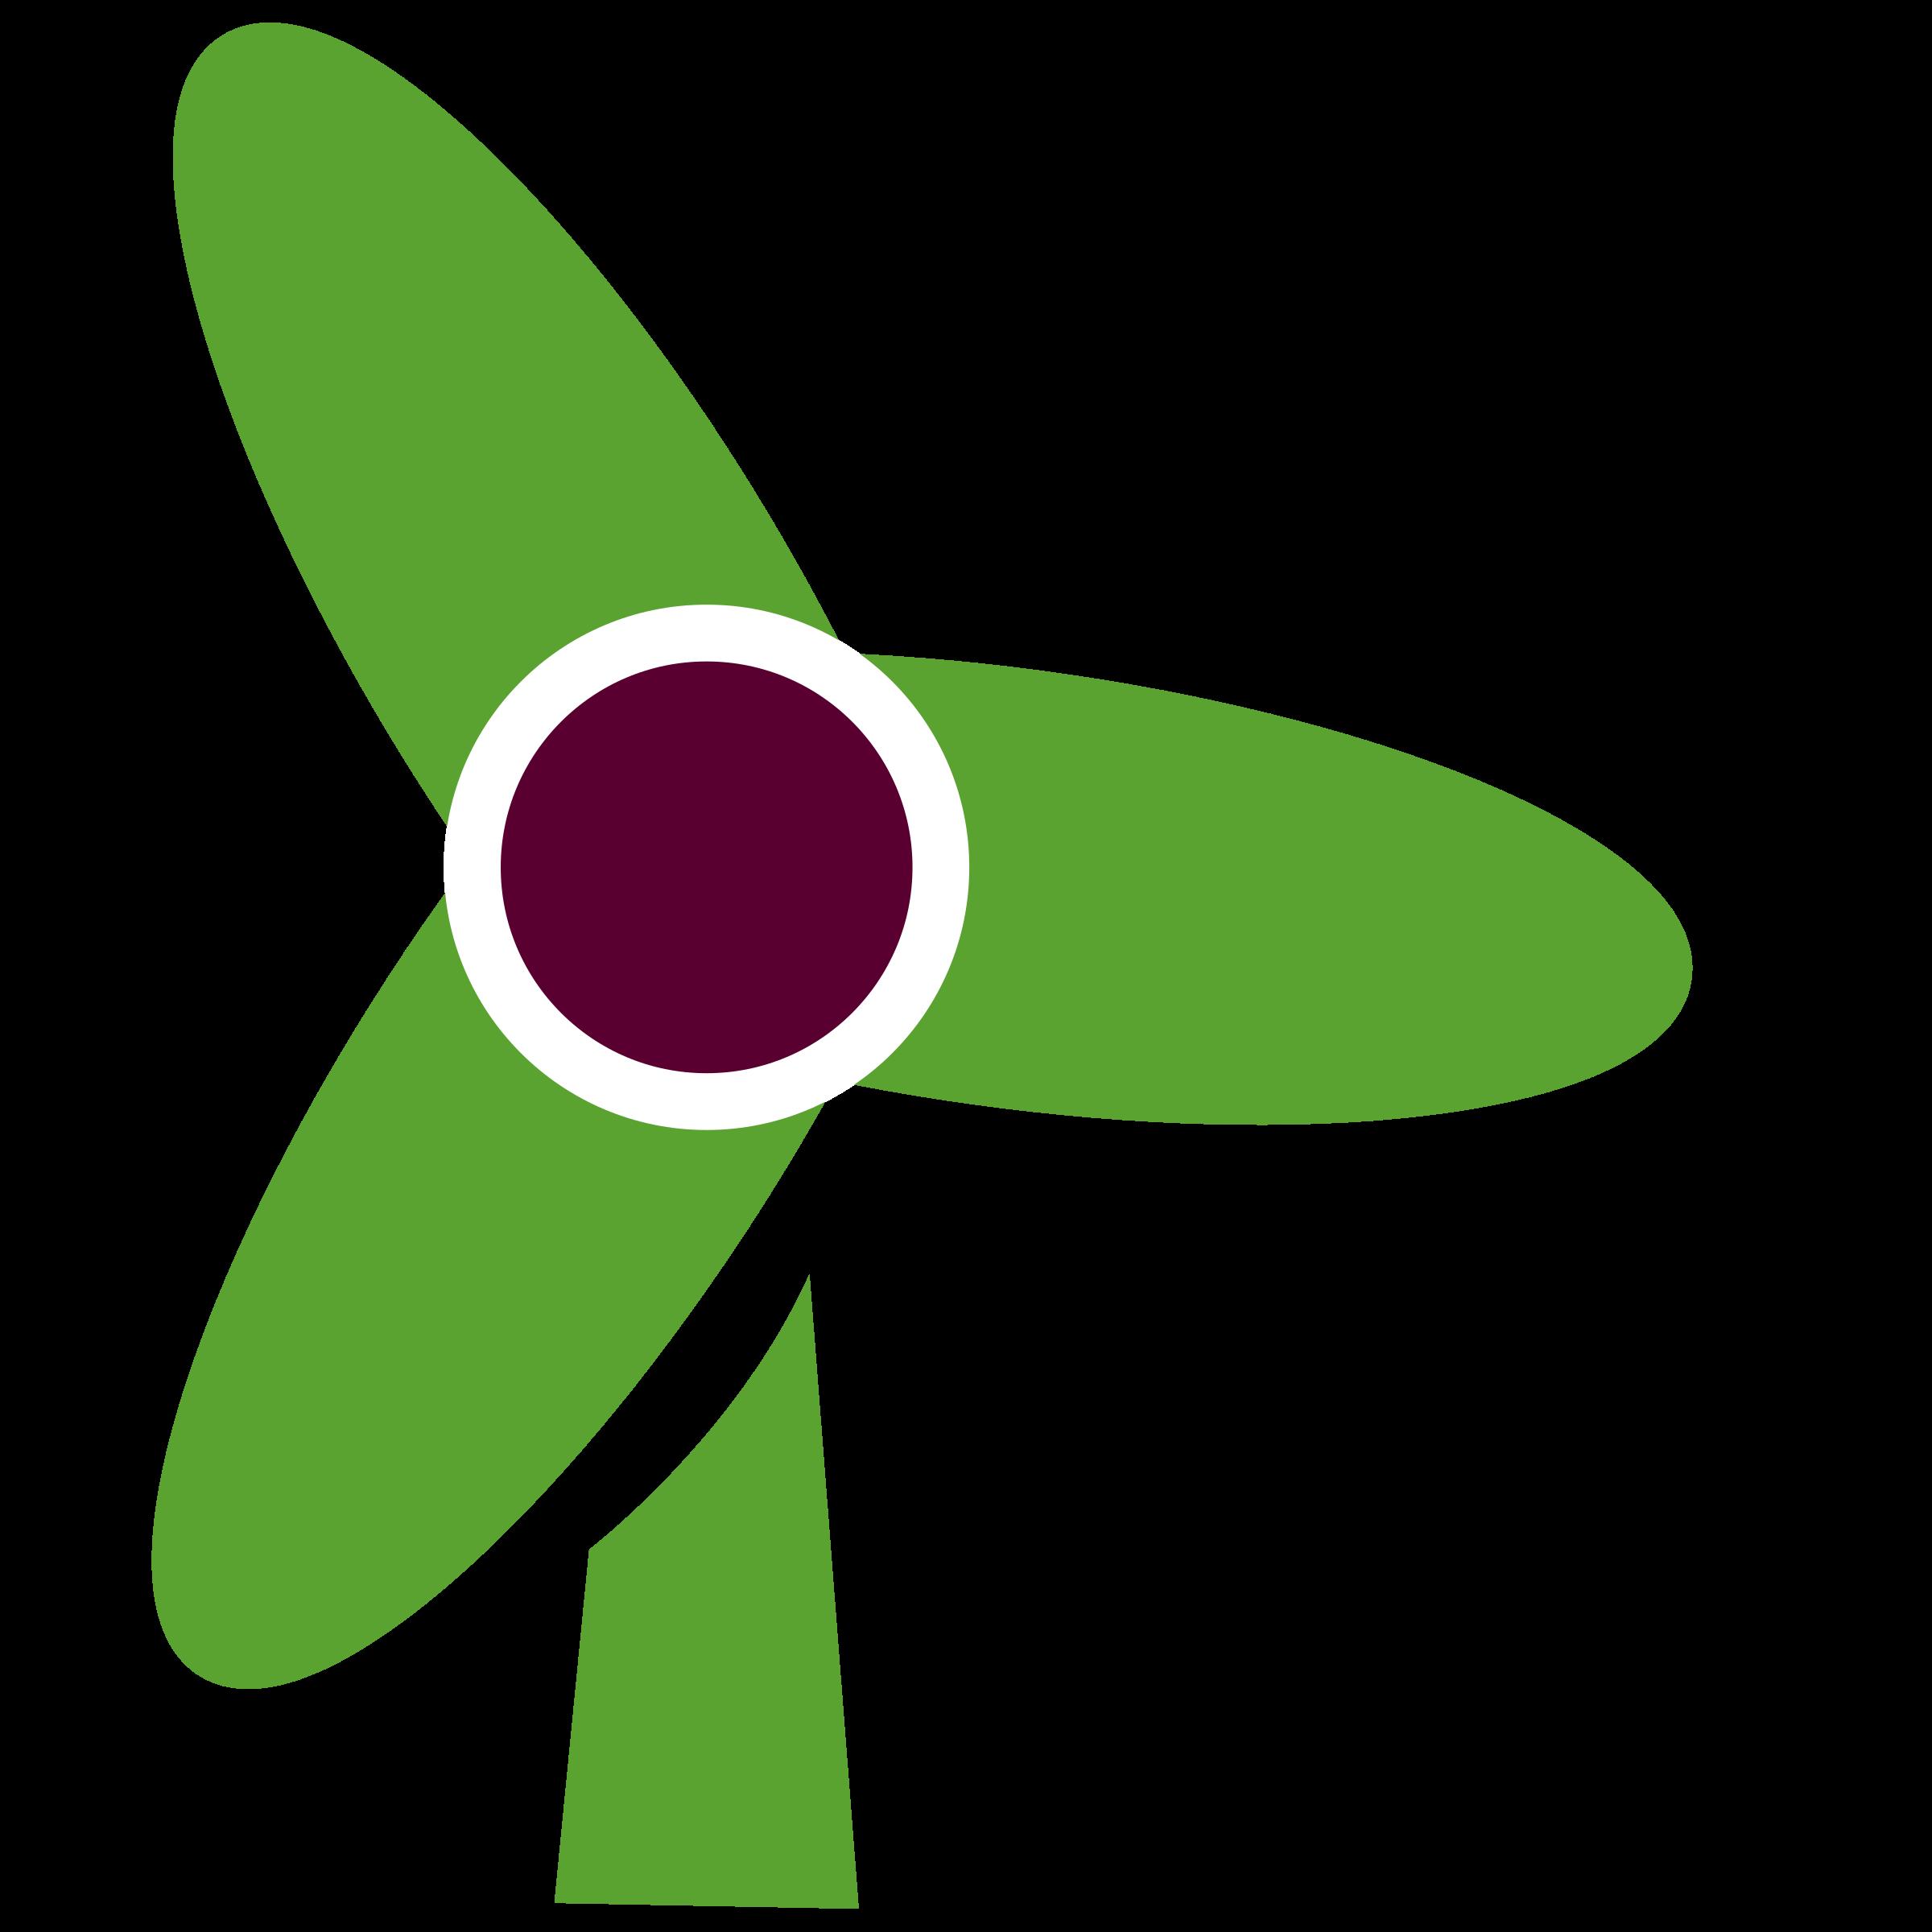 Turbine clipart wind turbine Turbine Clipart ClipartBarn wind wind